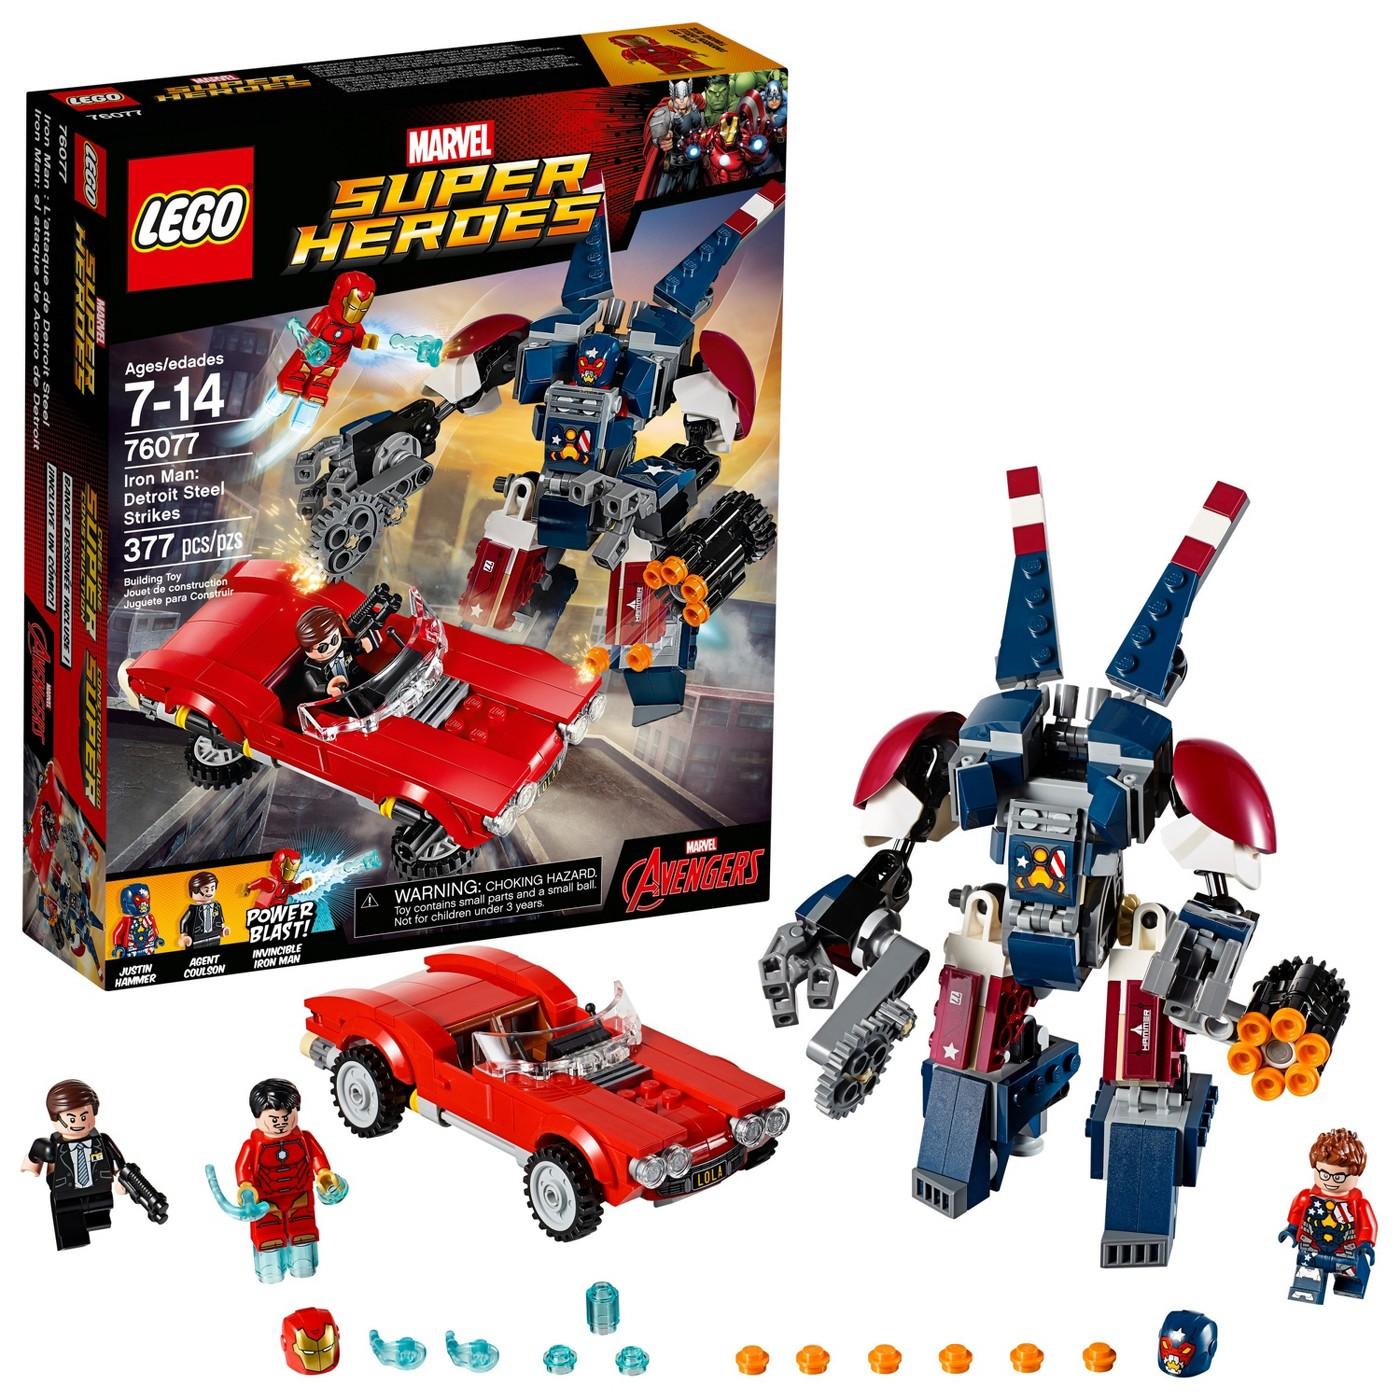 LEGO® Super Heroes Iron Man: Detroit Steel Strikes 76077 - image 1 of 12